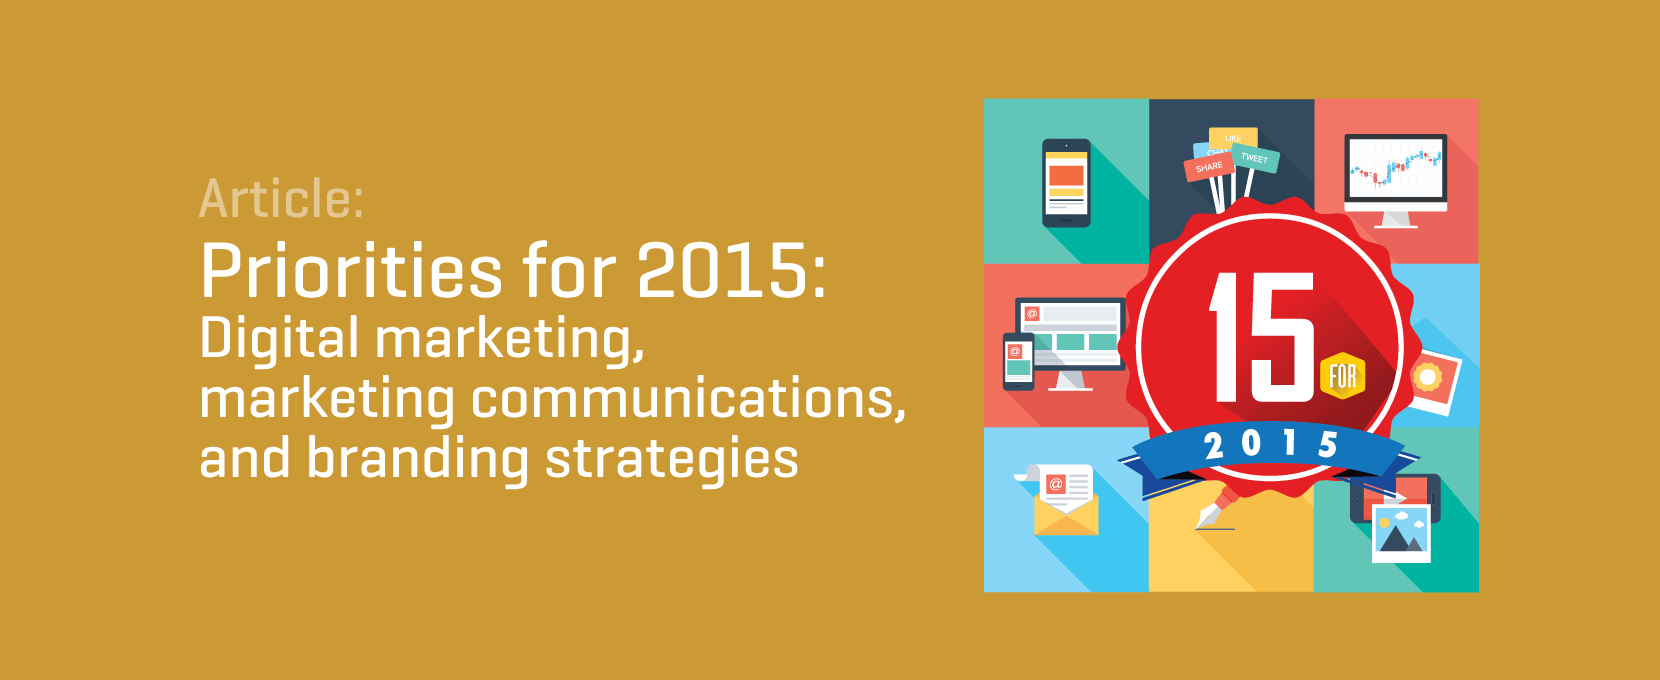 marketing-priorities-20154